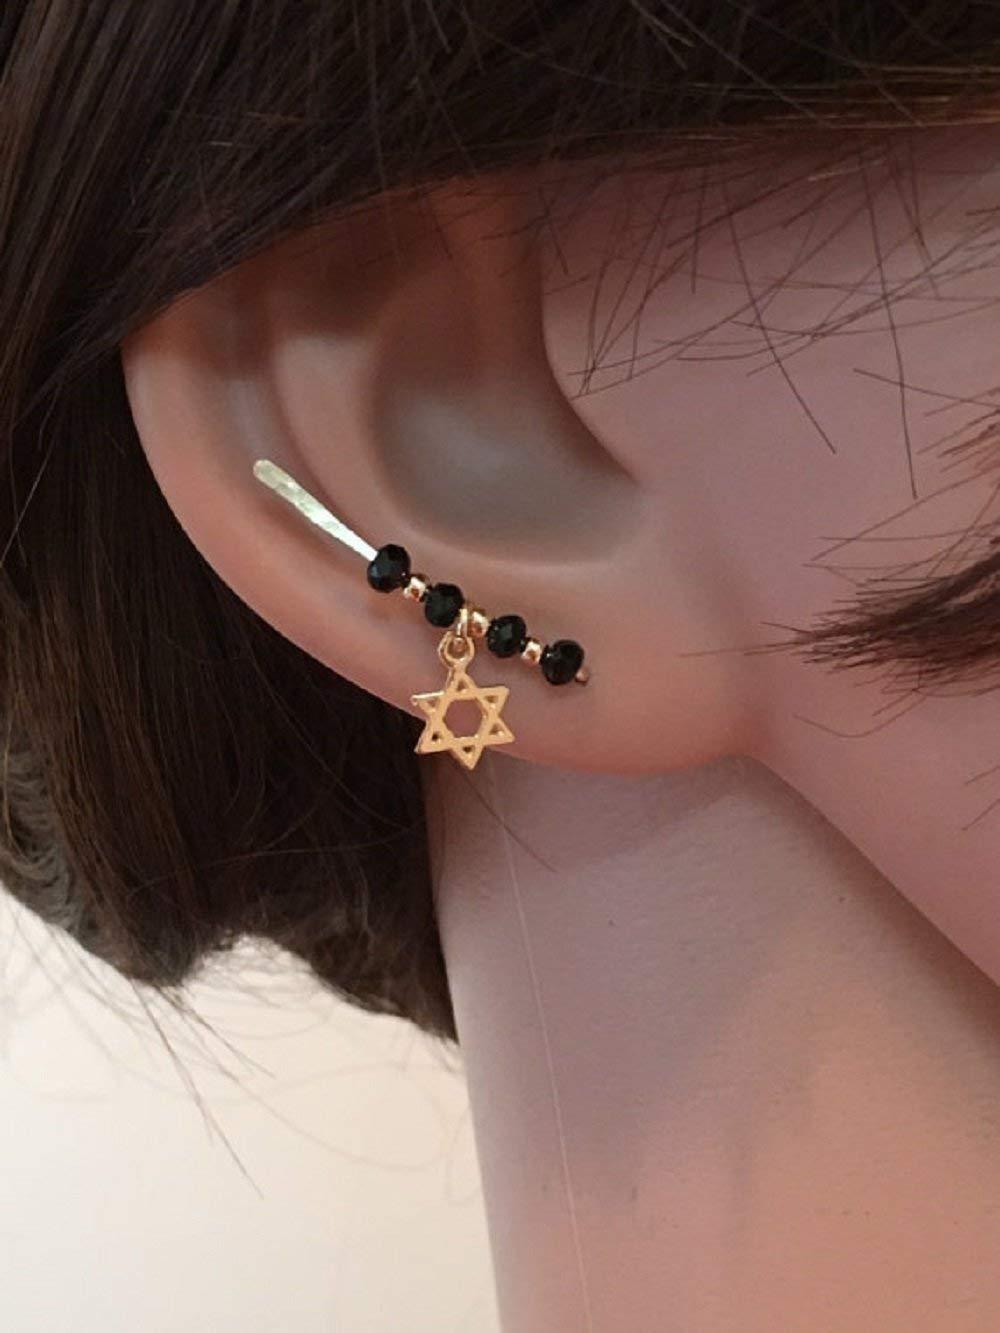 d44b1c3f3 Get Quotations · FloweRainboW Magen David Ear Climber x1, hammered earring, earring  pins, earring climbers,